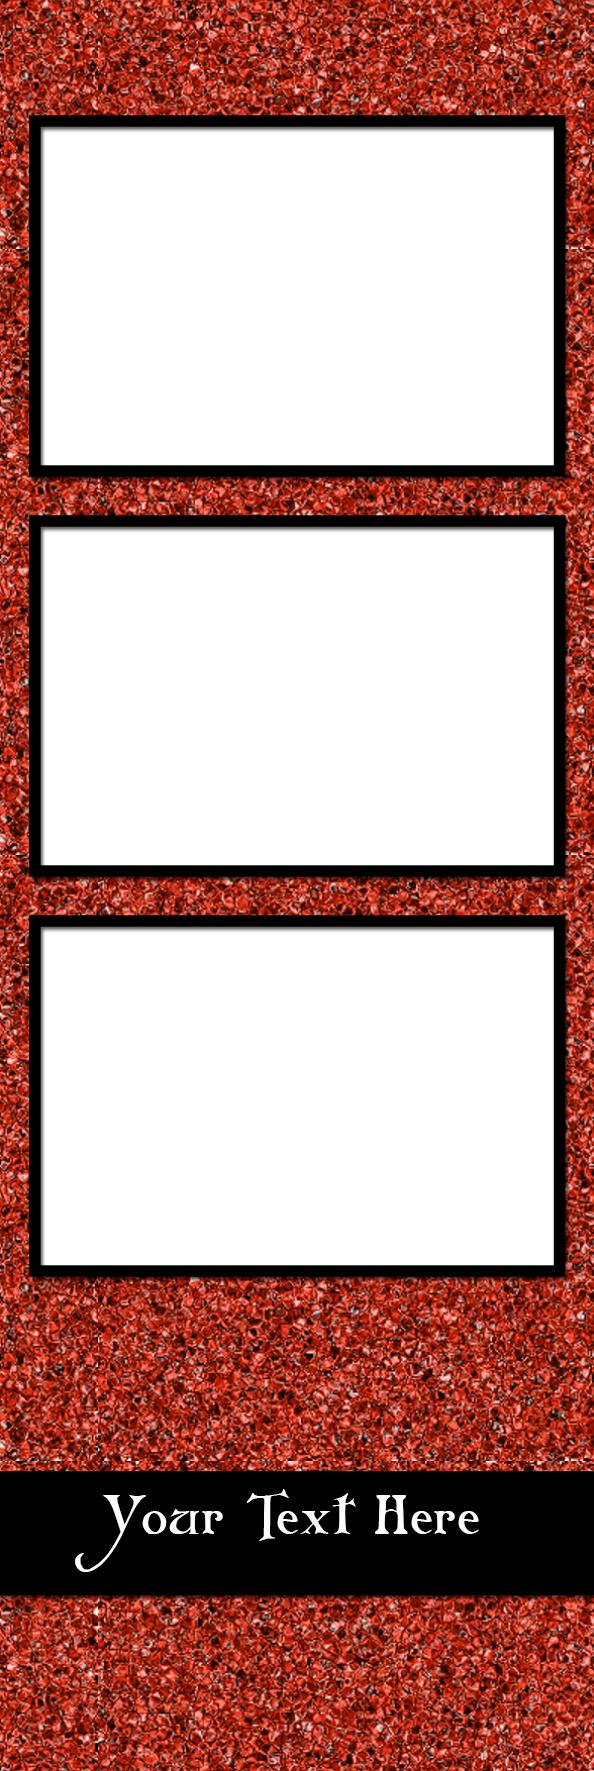 Texture_Glitter-V-6P2.jpg